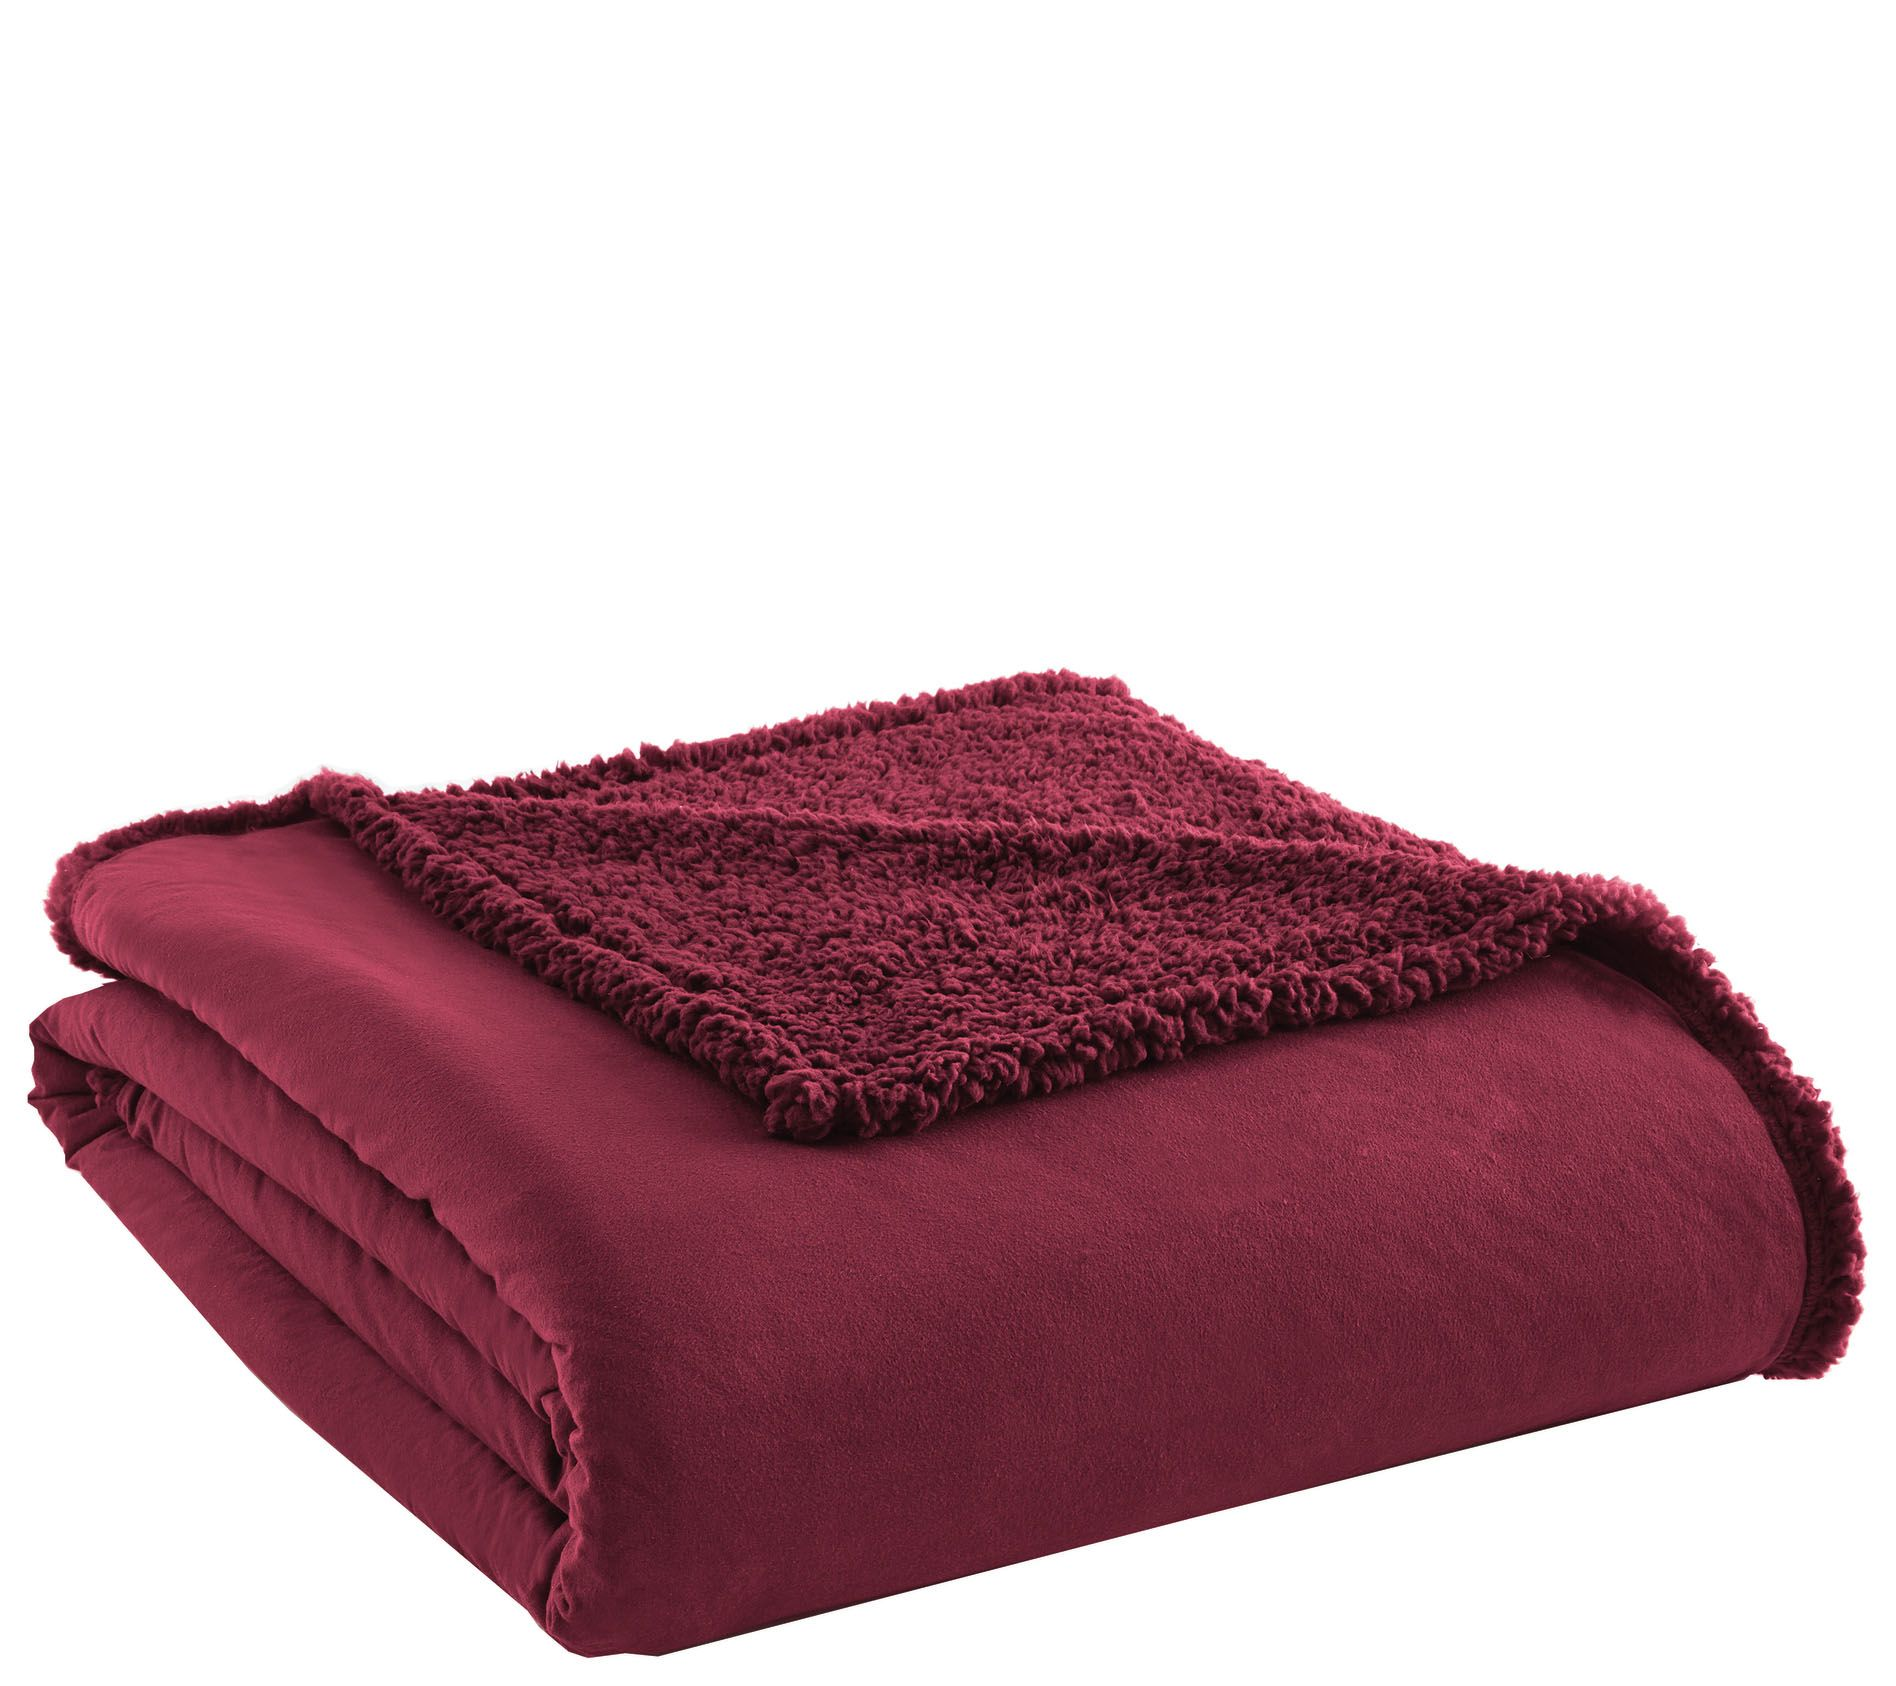 Sherpa Kitchen: Shavel Micro Flannel Sherpa Full/Queen Blanket